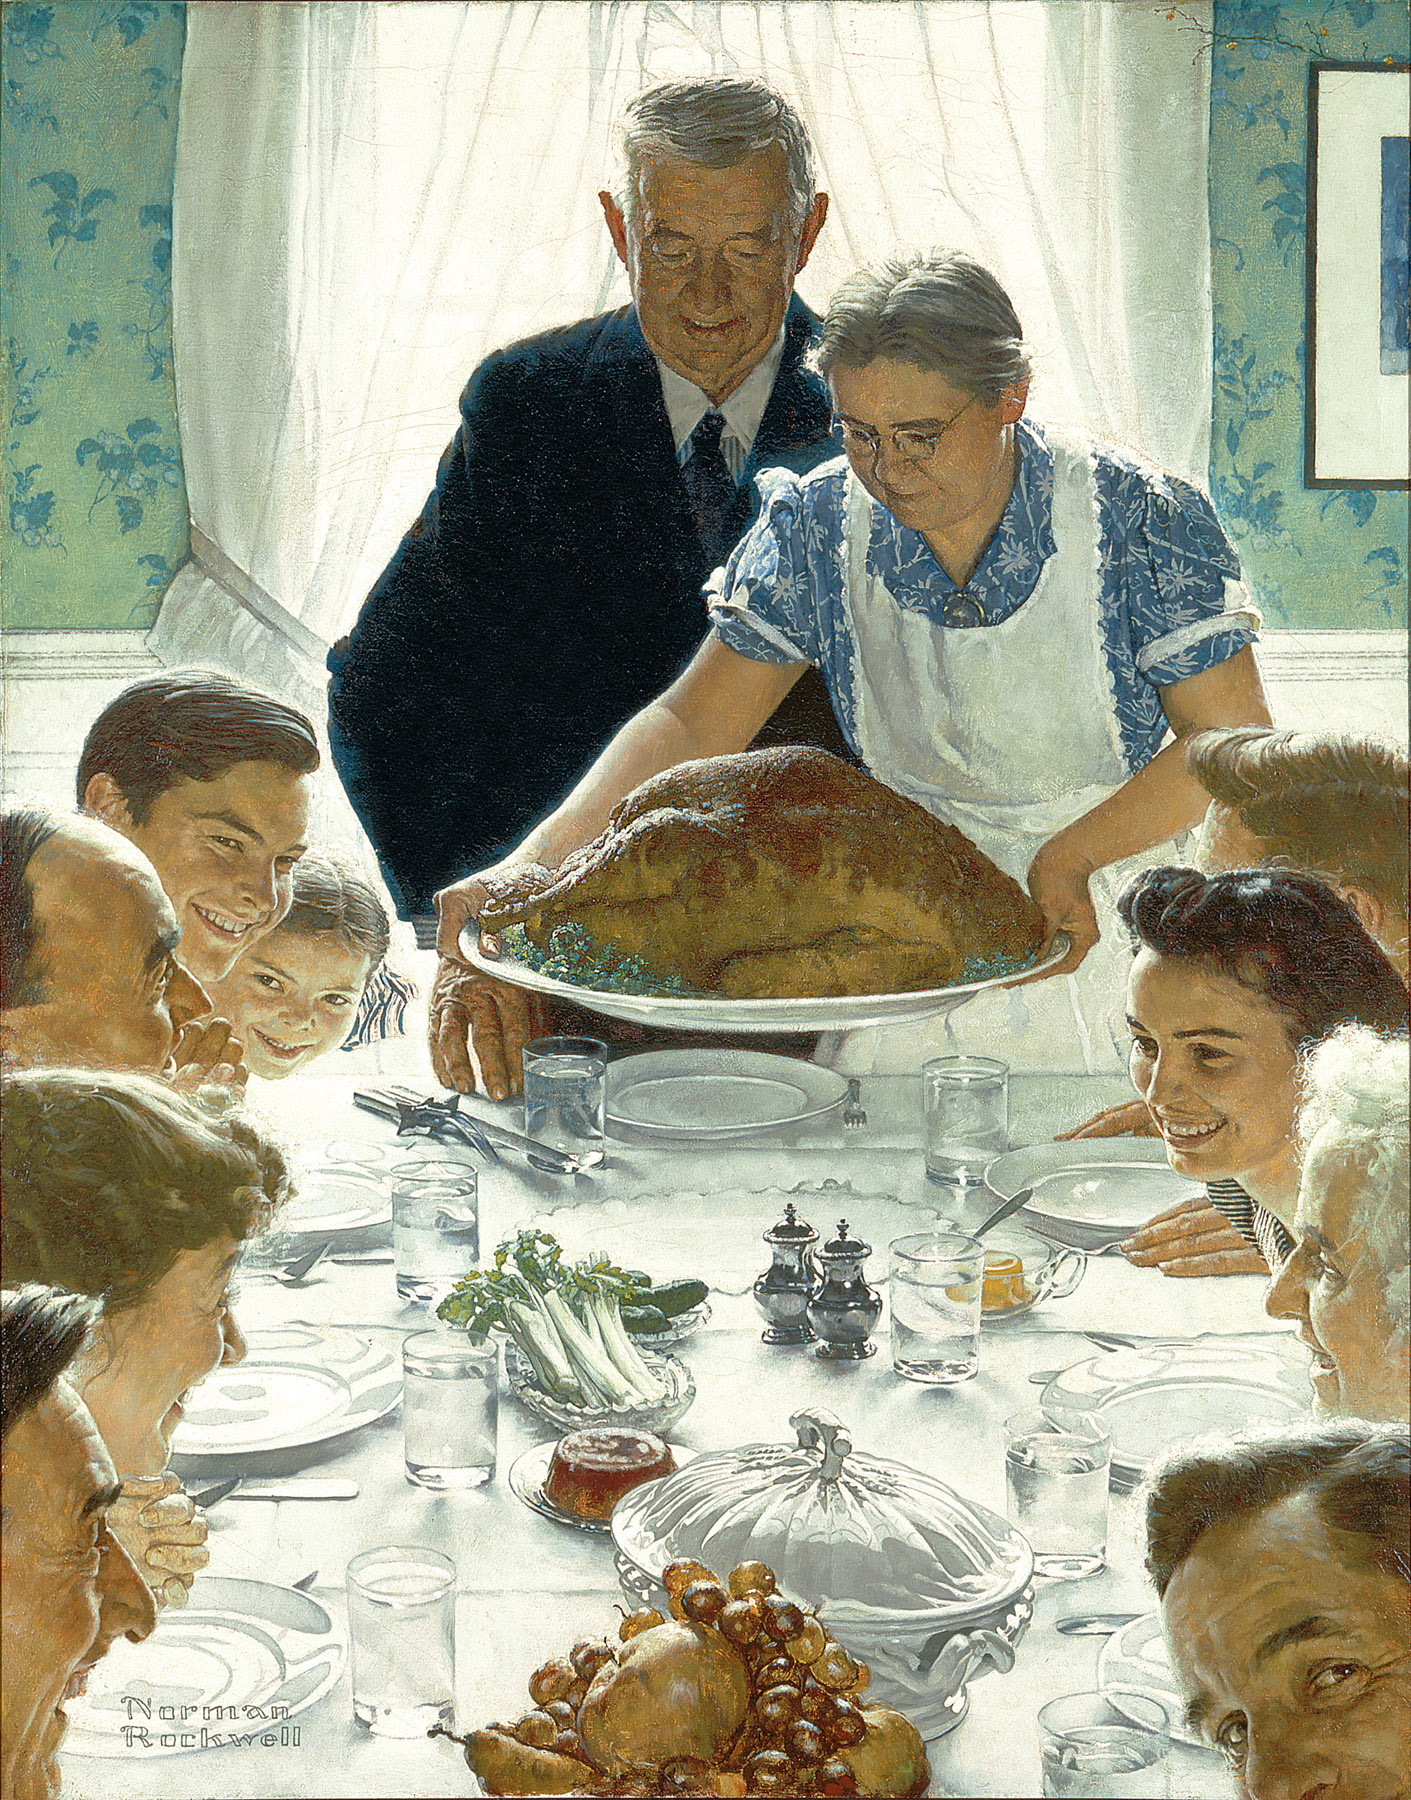 ThanksgivingSaysWereAwesome_Rockwell.jpg